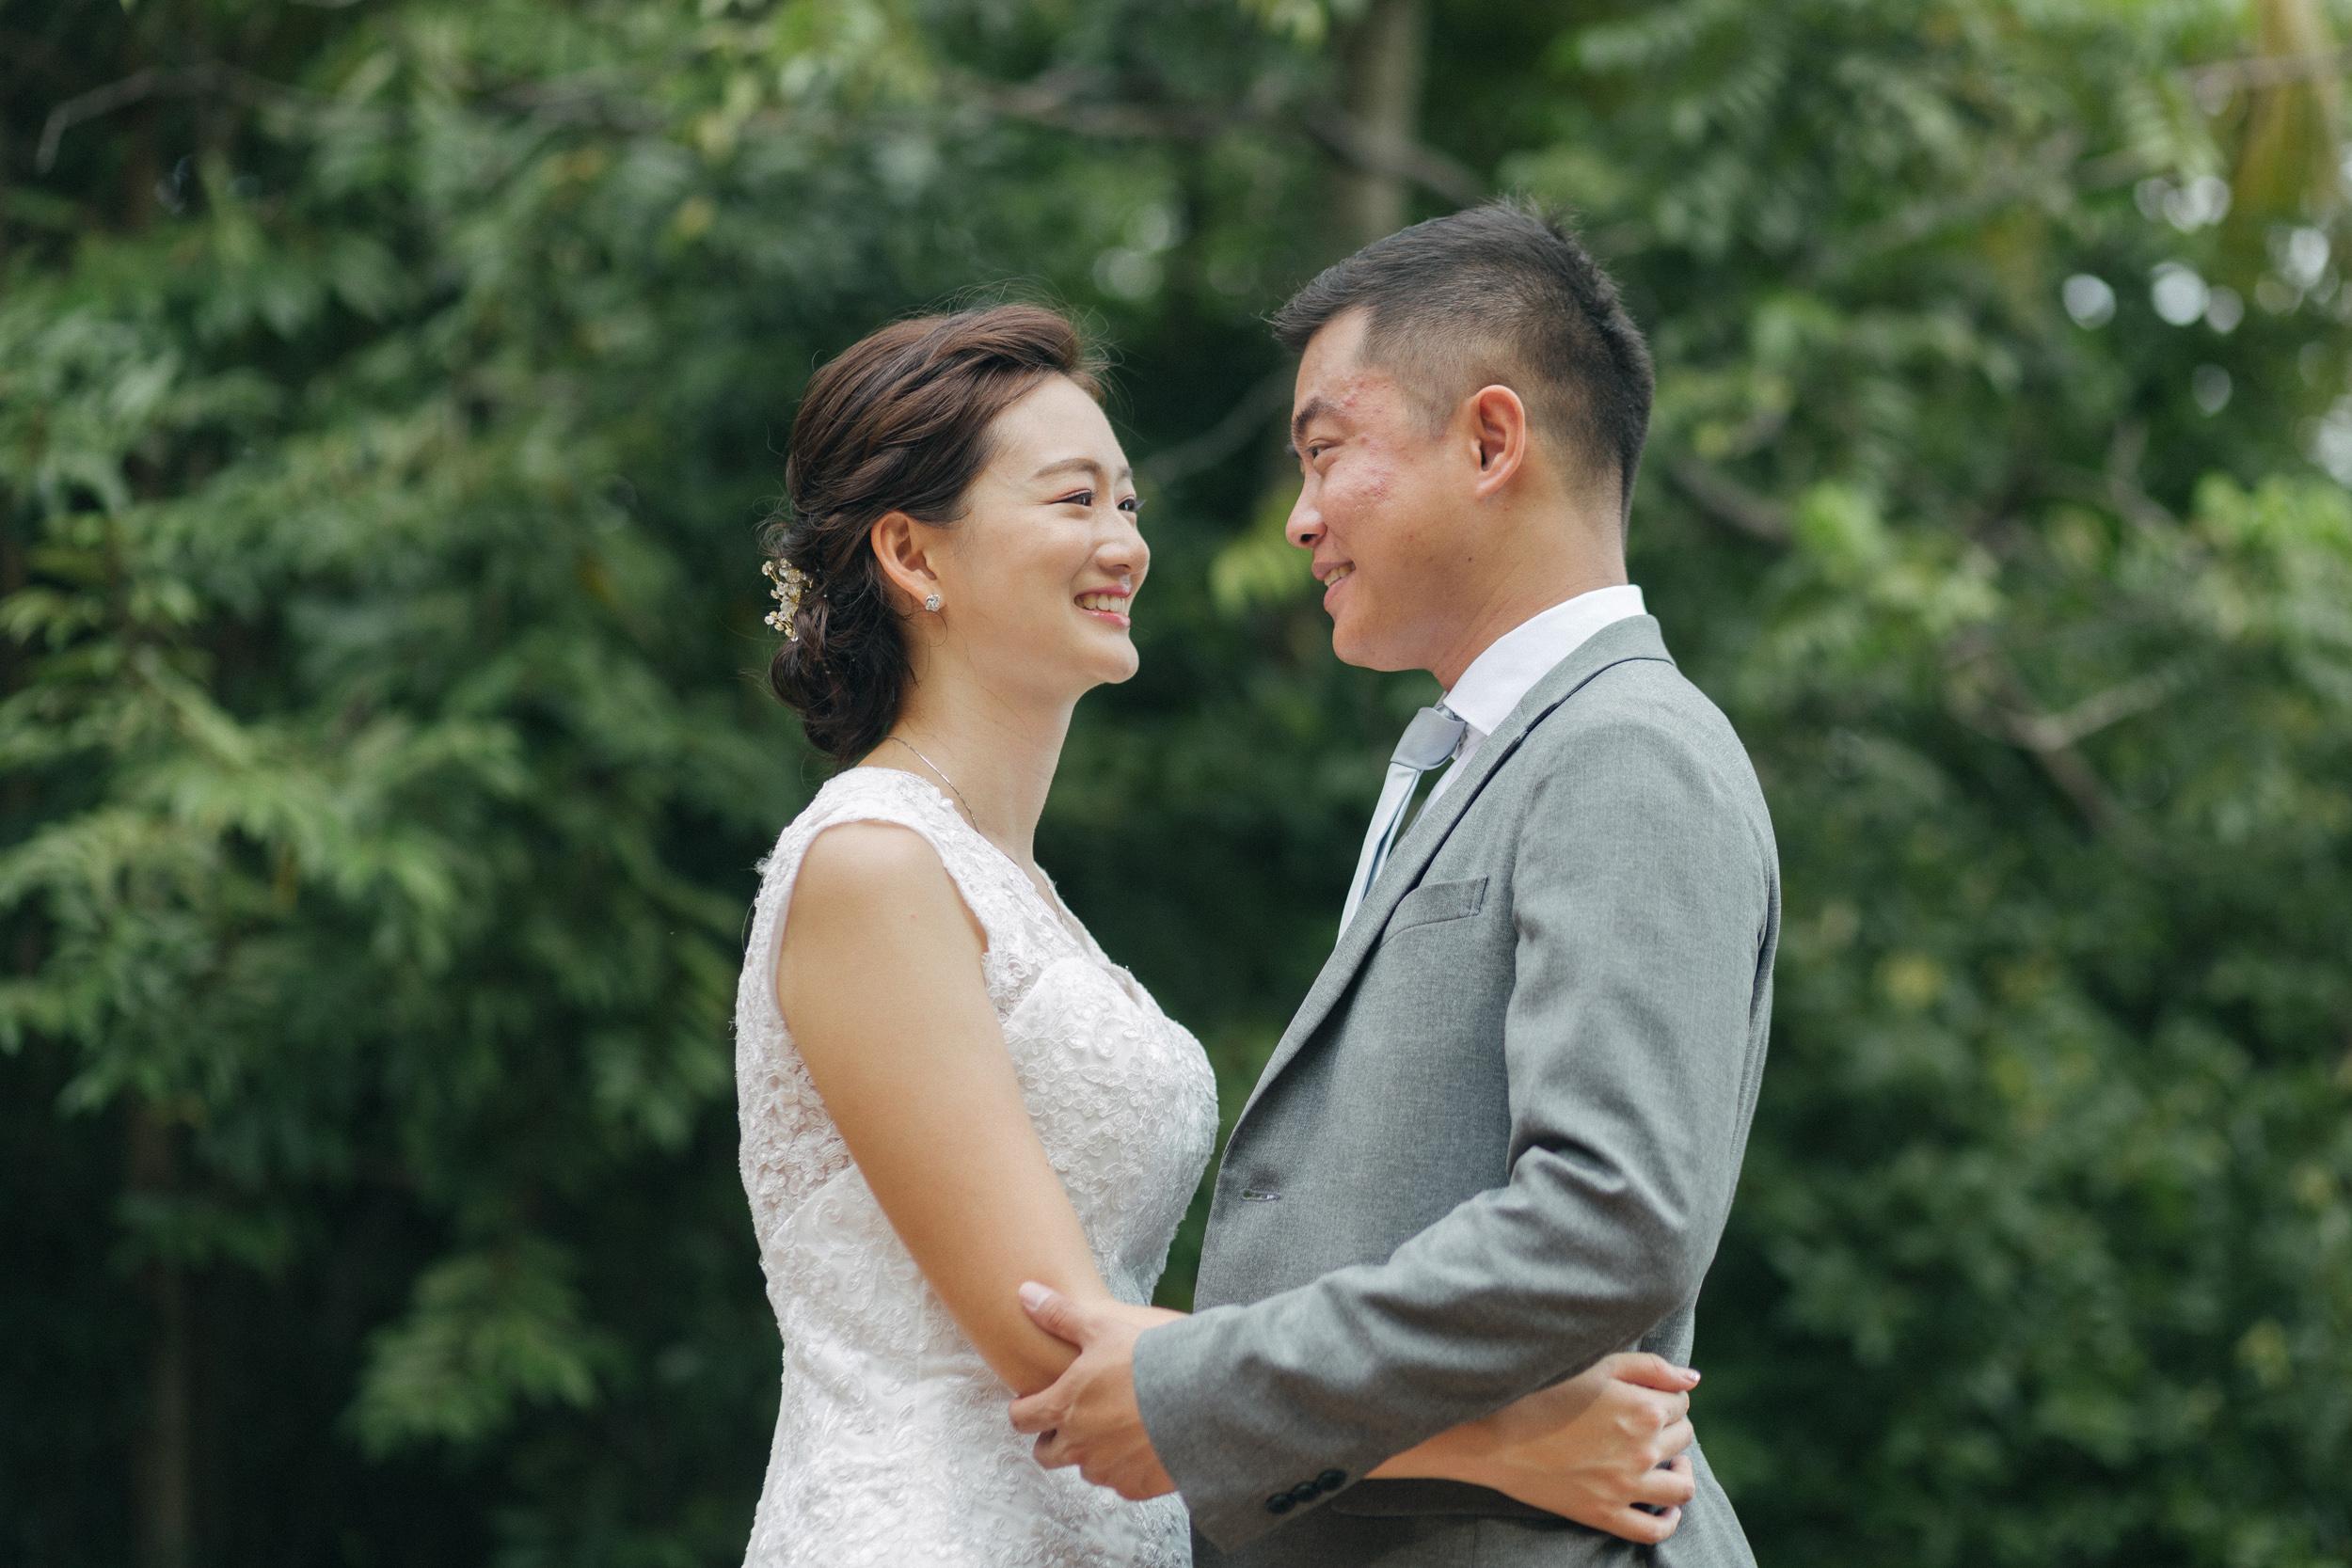 singapore-wedding-photographer-wemadethese-junekit-kingslin-07.jpg